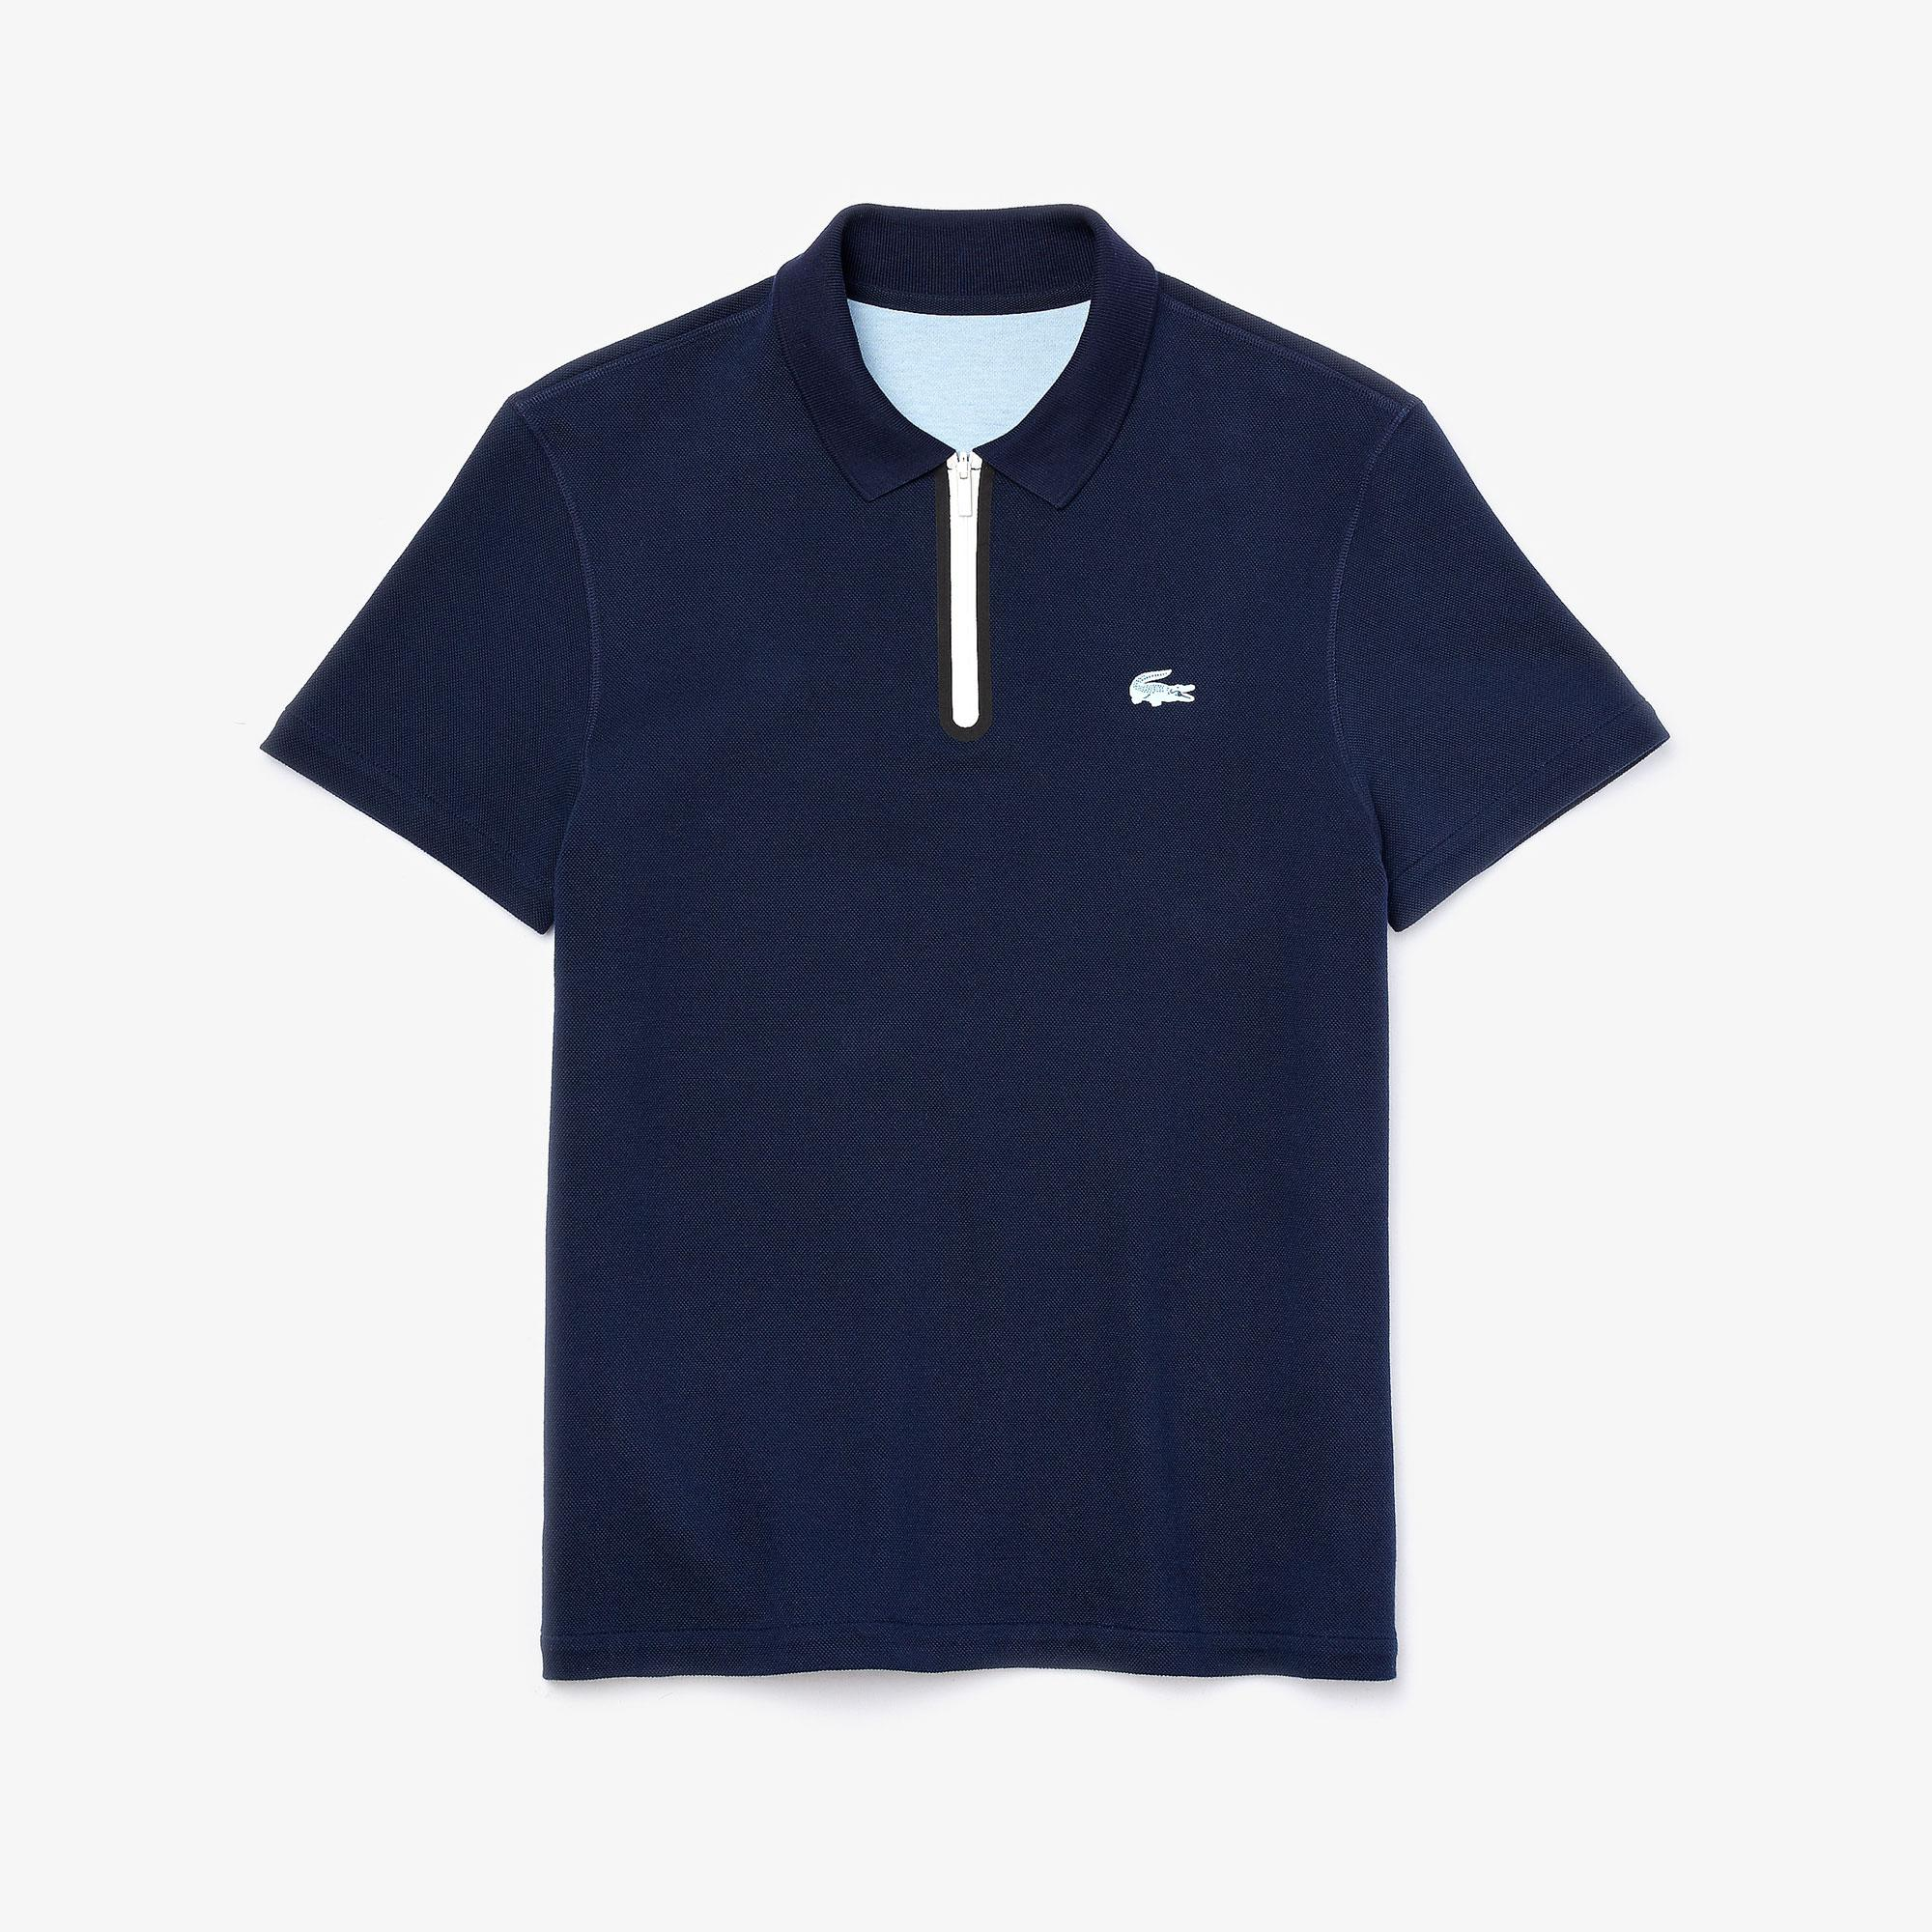 Lacoste Men's Zippered Collar Regular Fit Reversible Piqué Polo